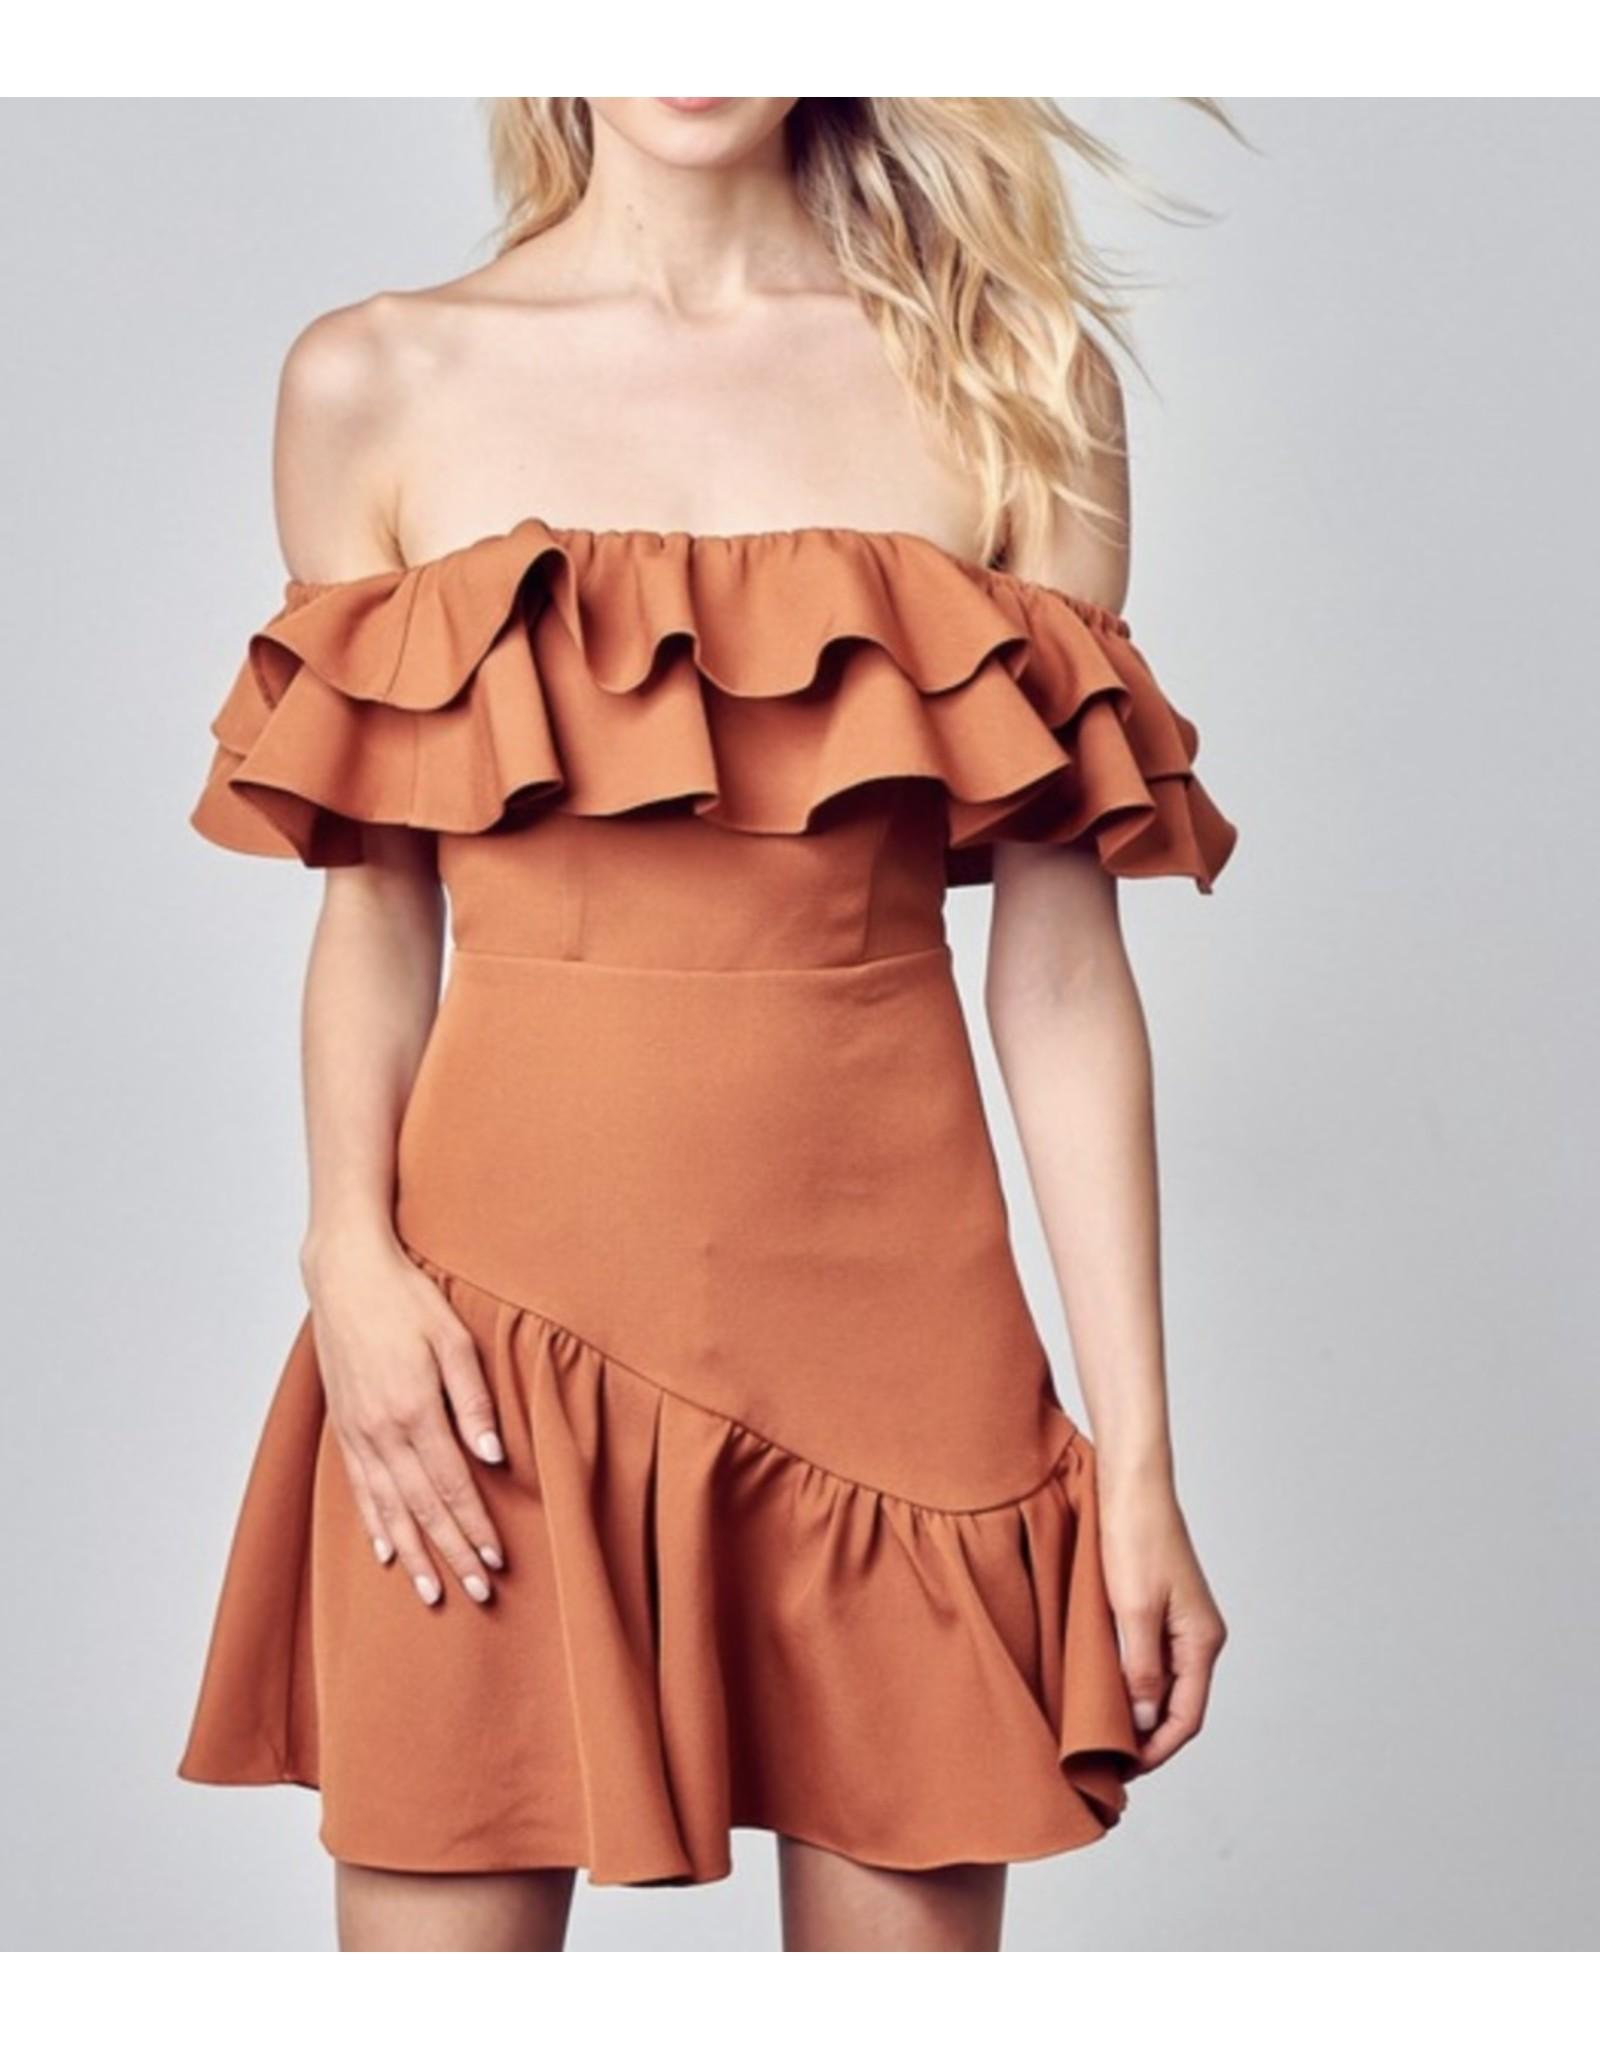 Assymetrical Ruffle Dress - Ginger